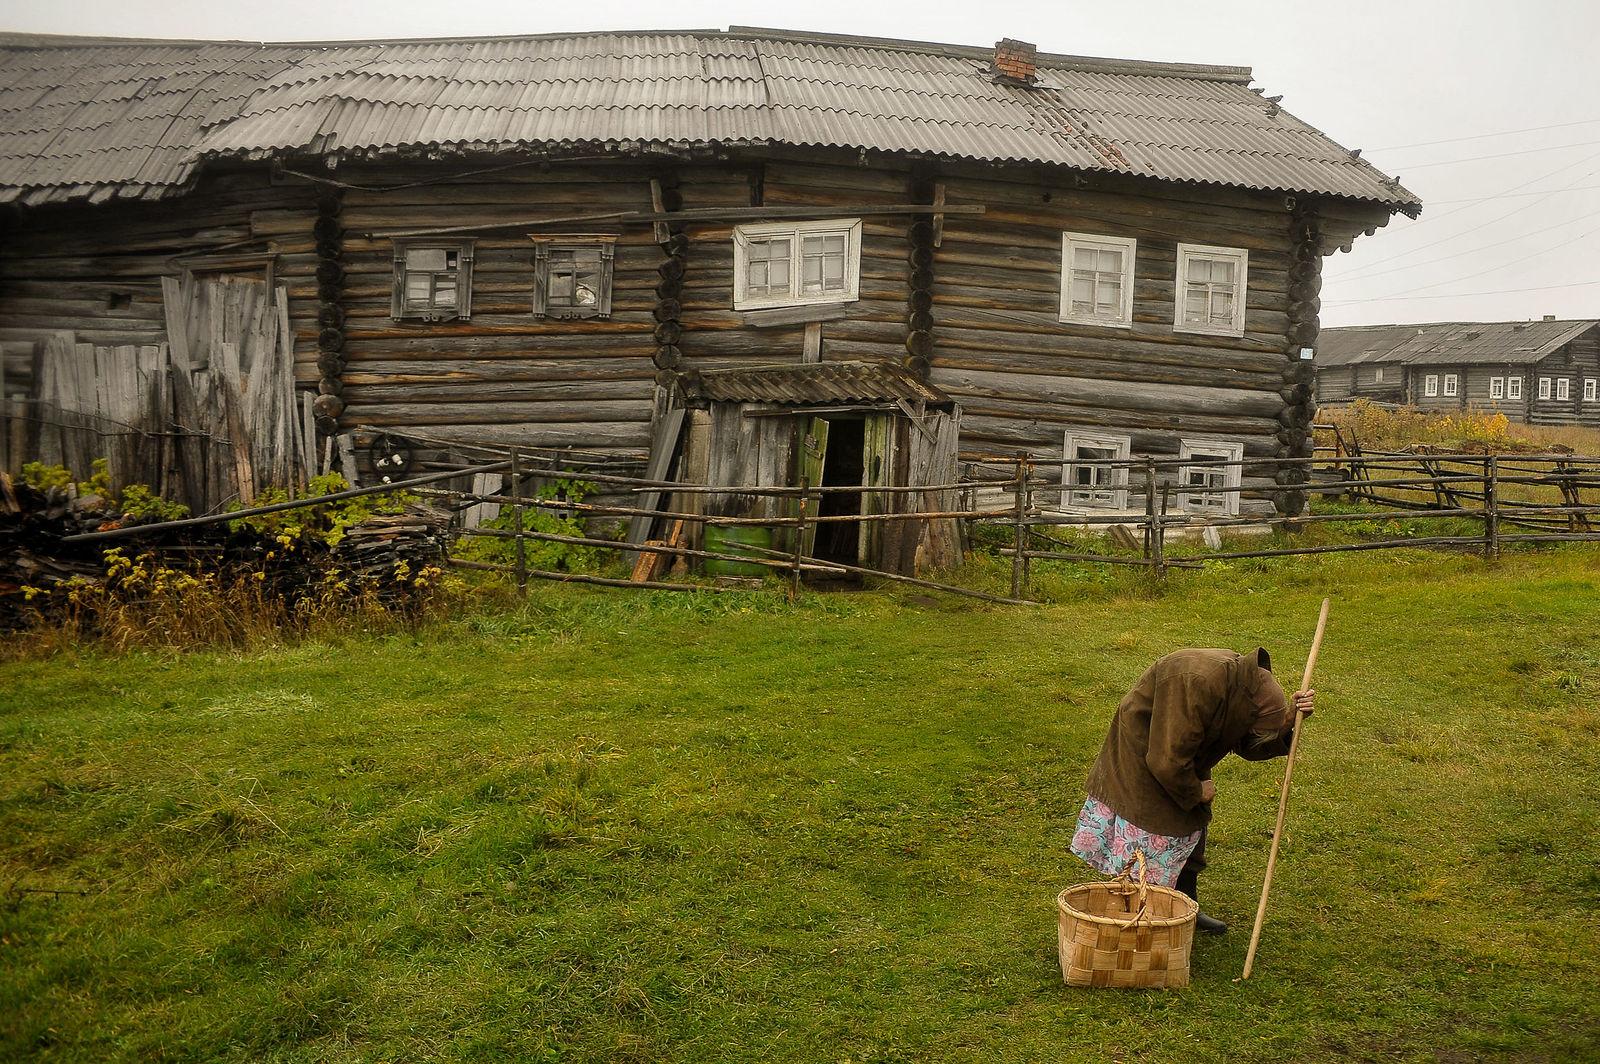 Arik Shraga. Neglected in the village. The last resident of Kochmogora